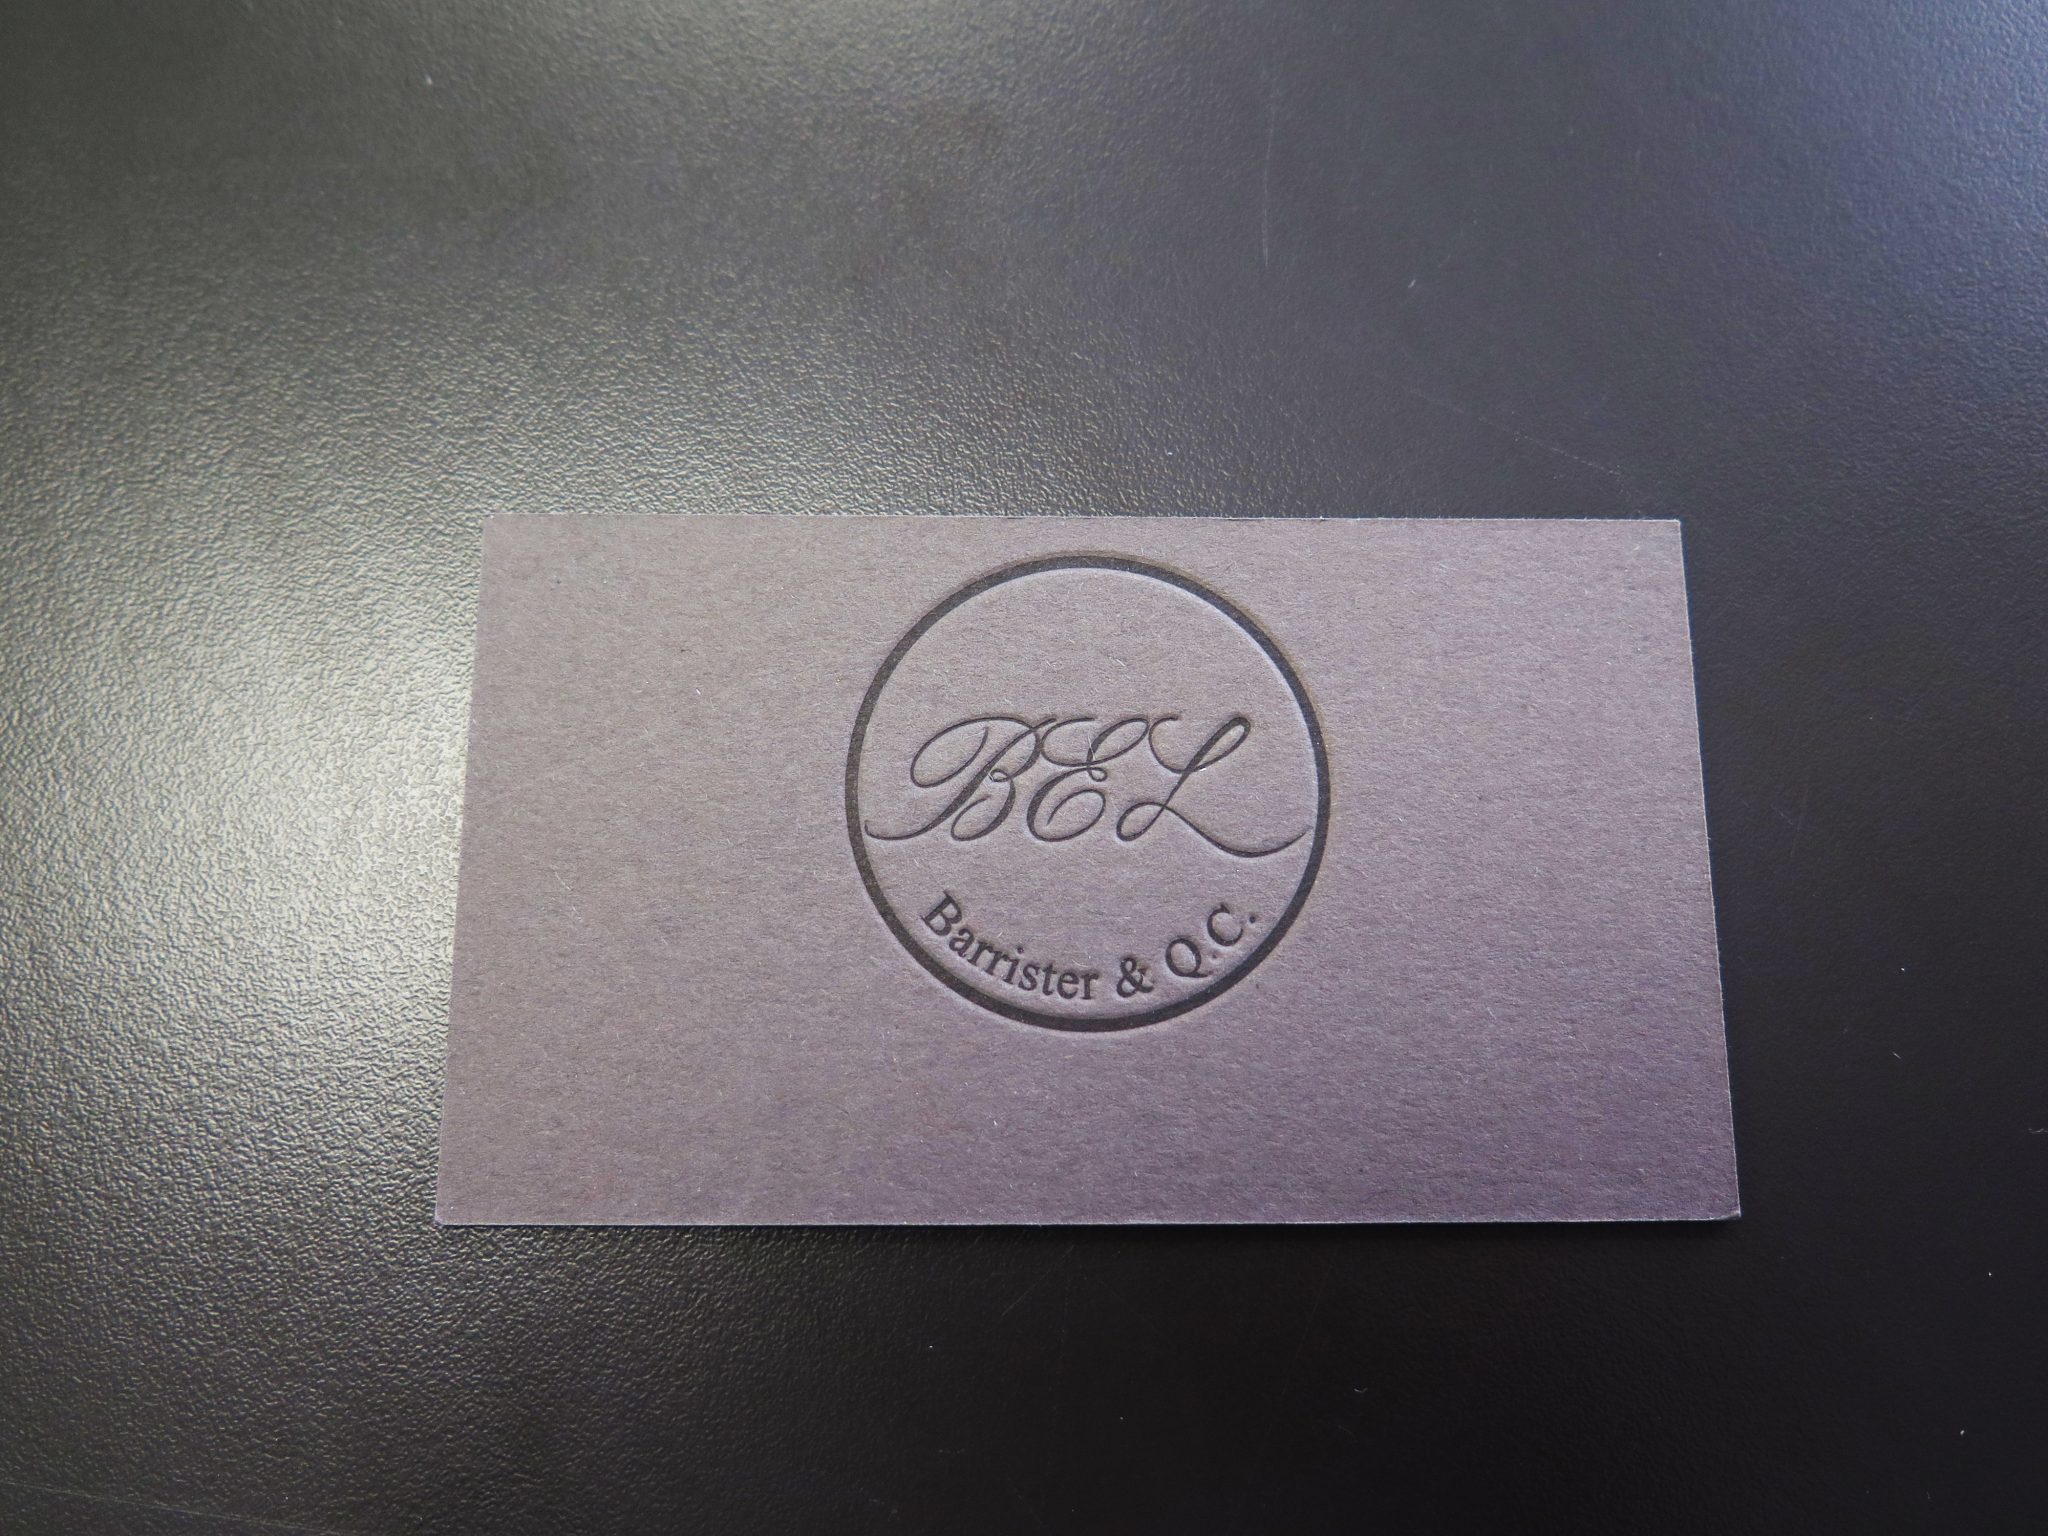 Letterpress business cards minuteman press letterpress business cards reheart Image collections